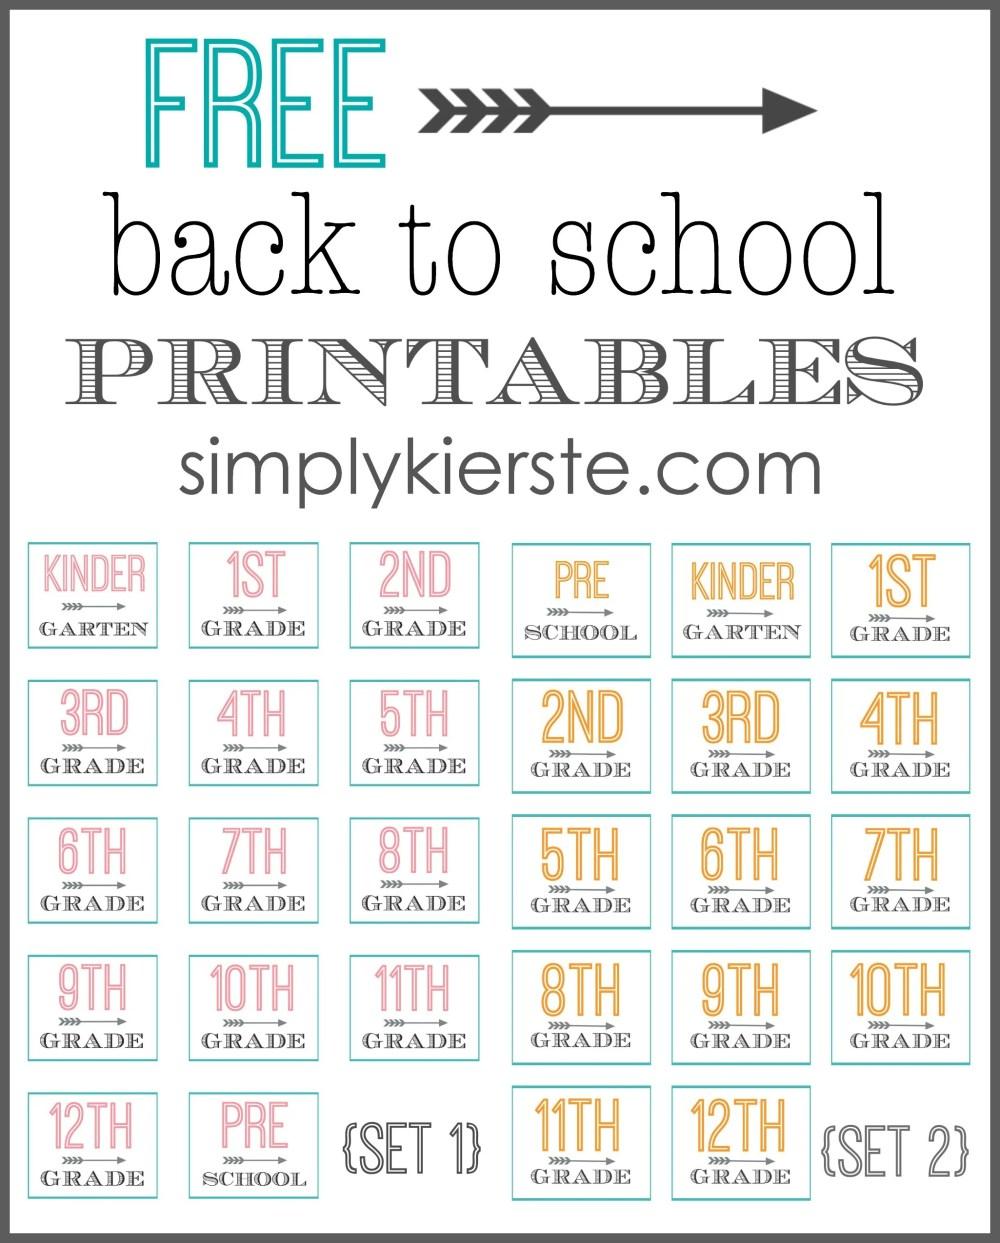 medium resolution of Free Back to School Printables   oldsaltfarm.com